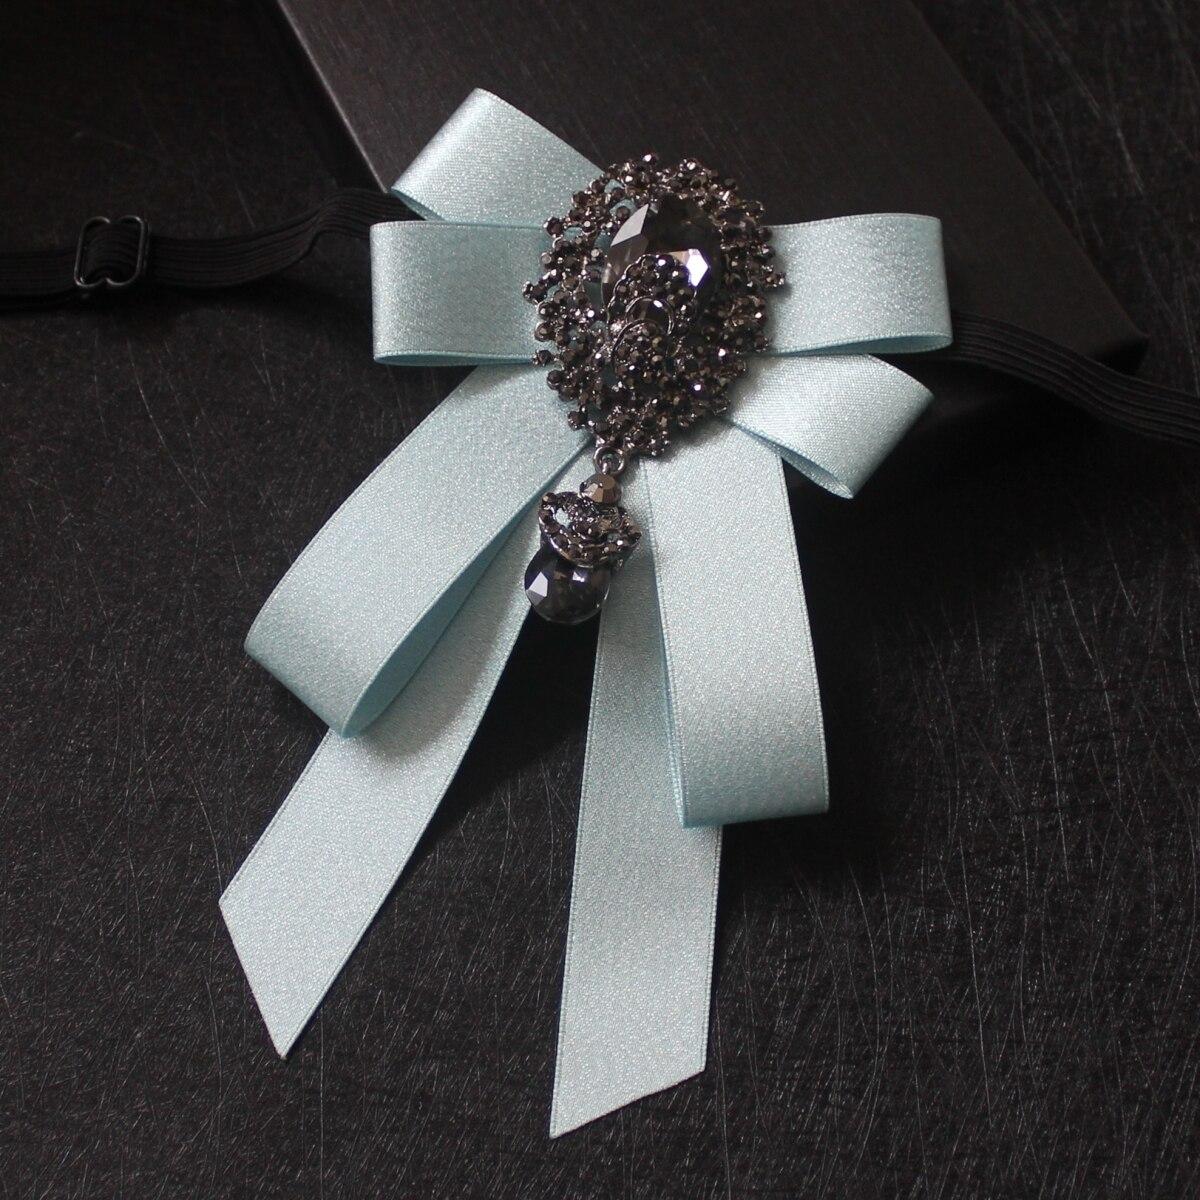 New men's suit shirt luxury rhinestone bow tie High-quality groom groomsman performance host stylist bow tie